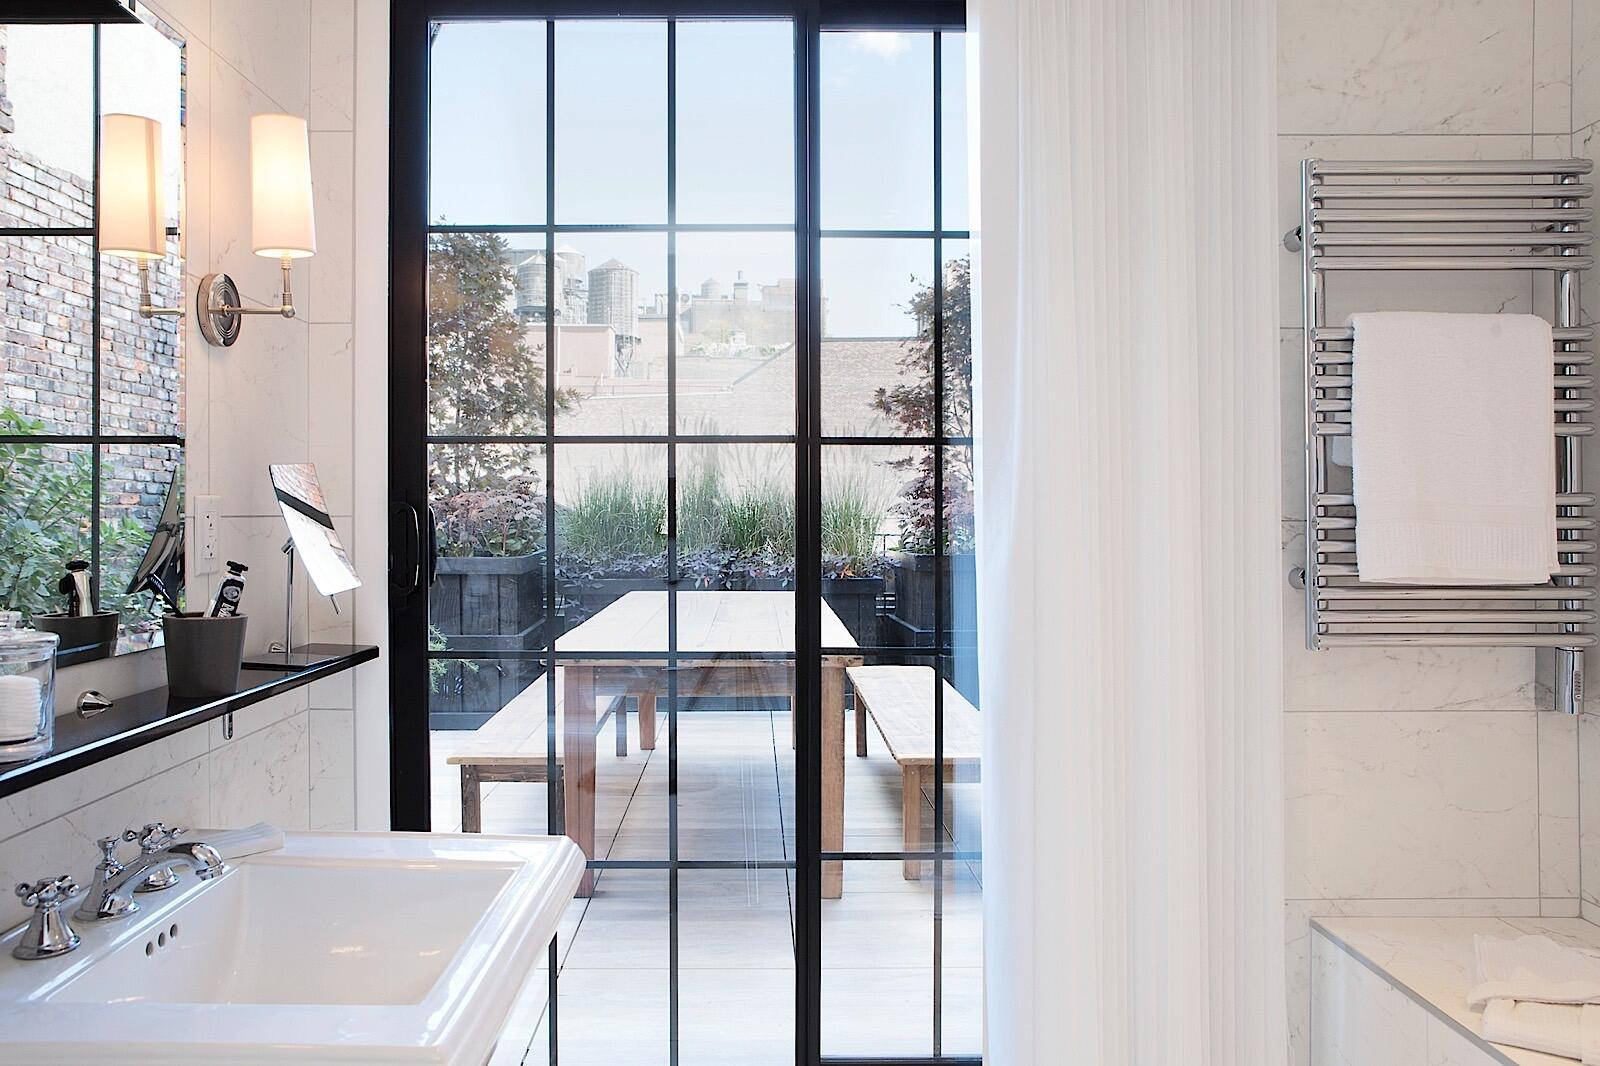 Penthouse Bathroom Window View of Terrace